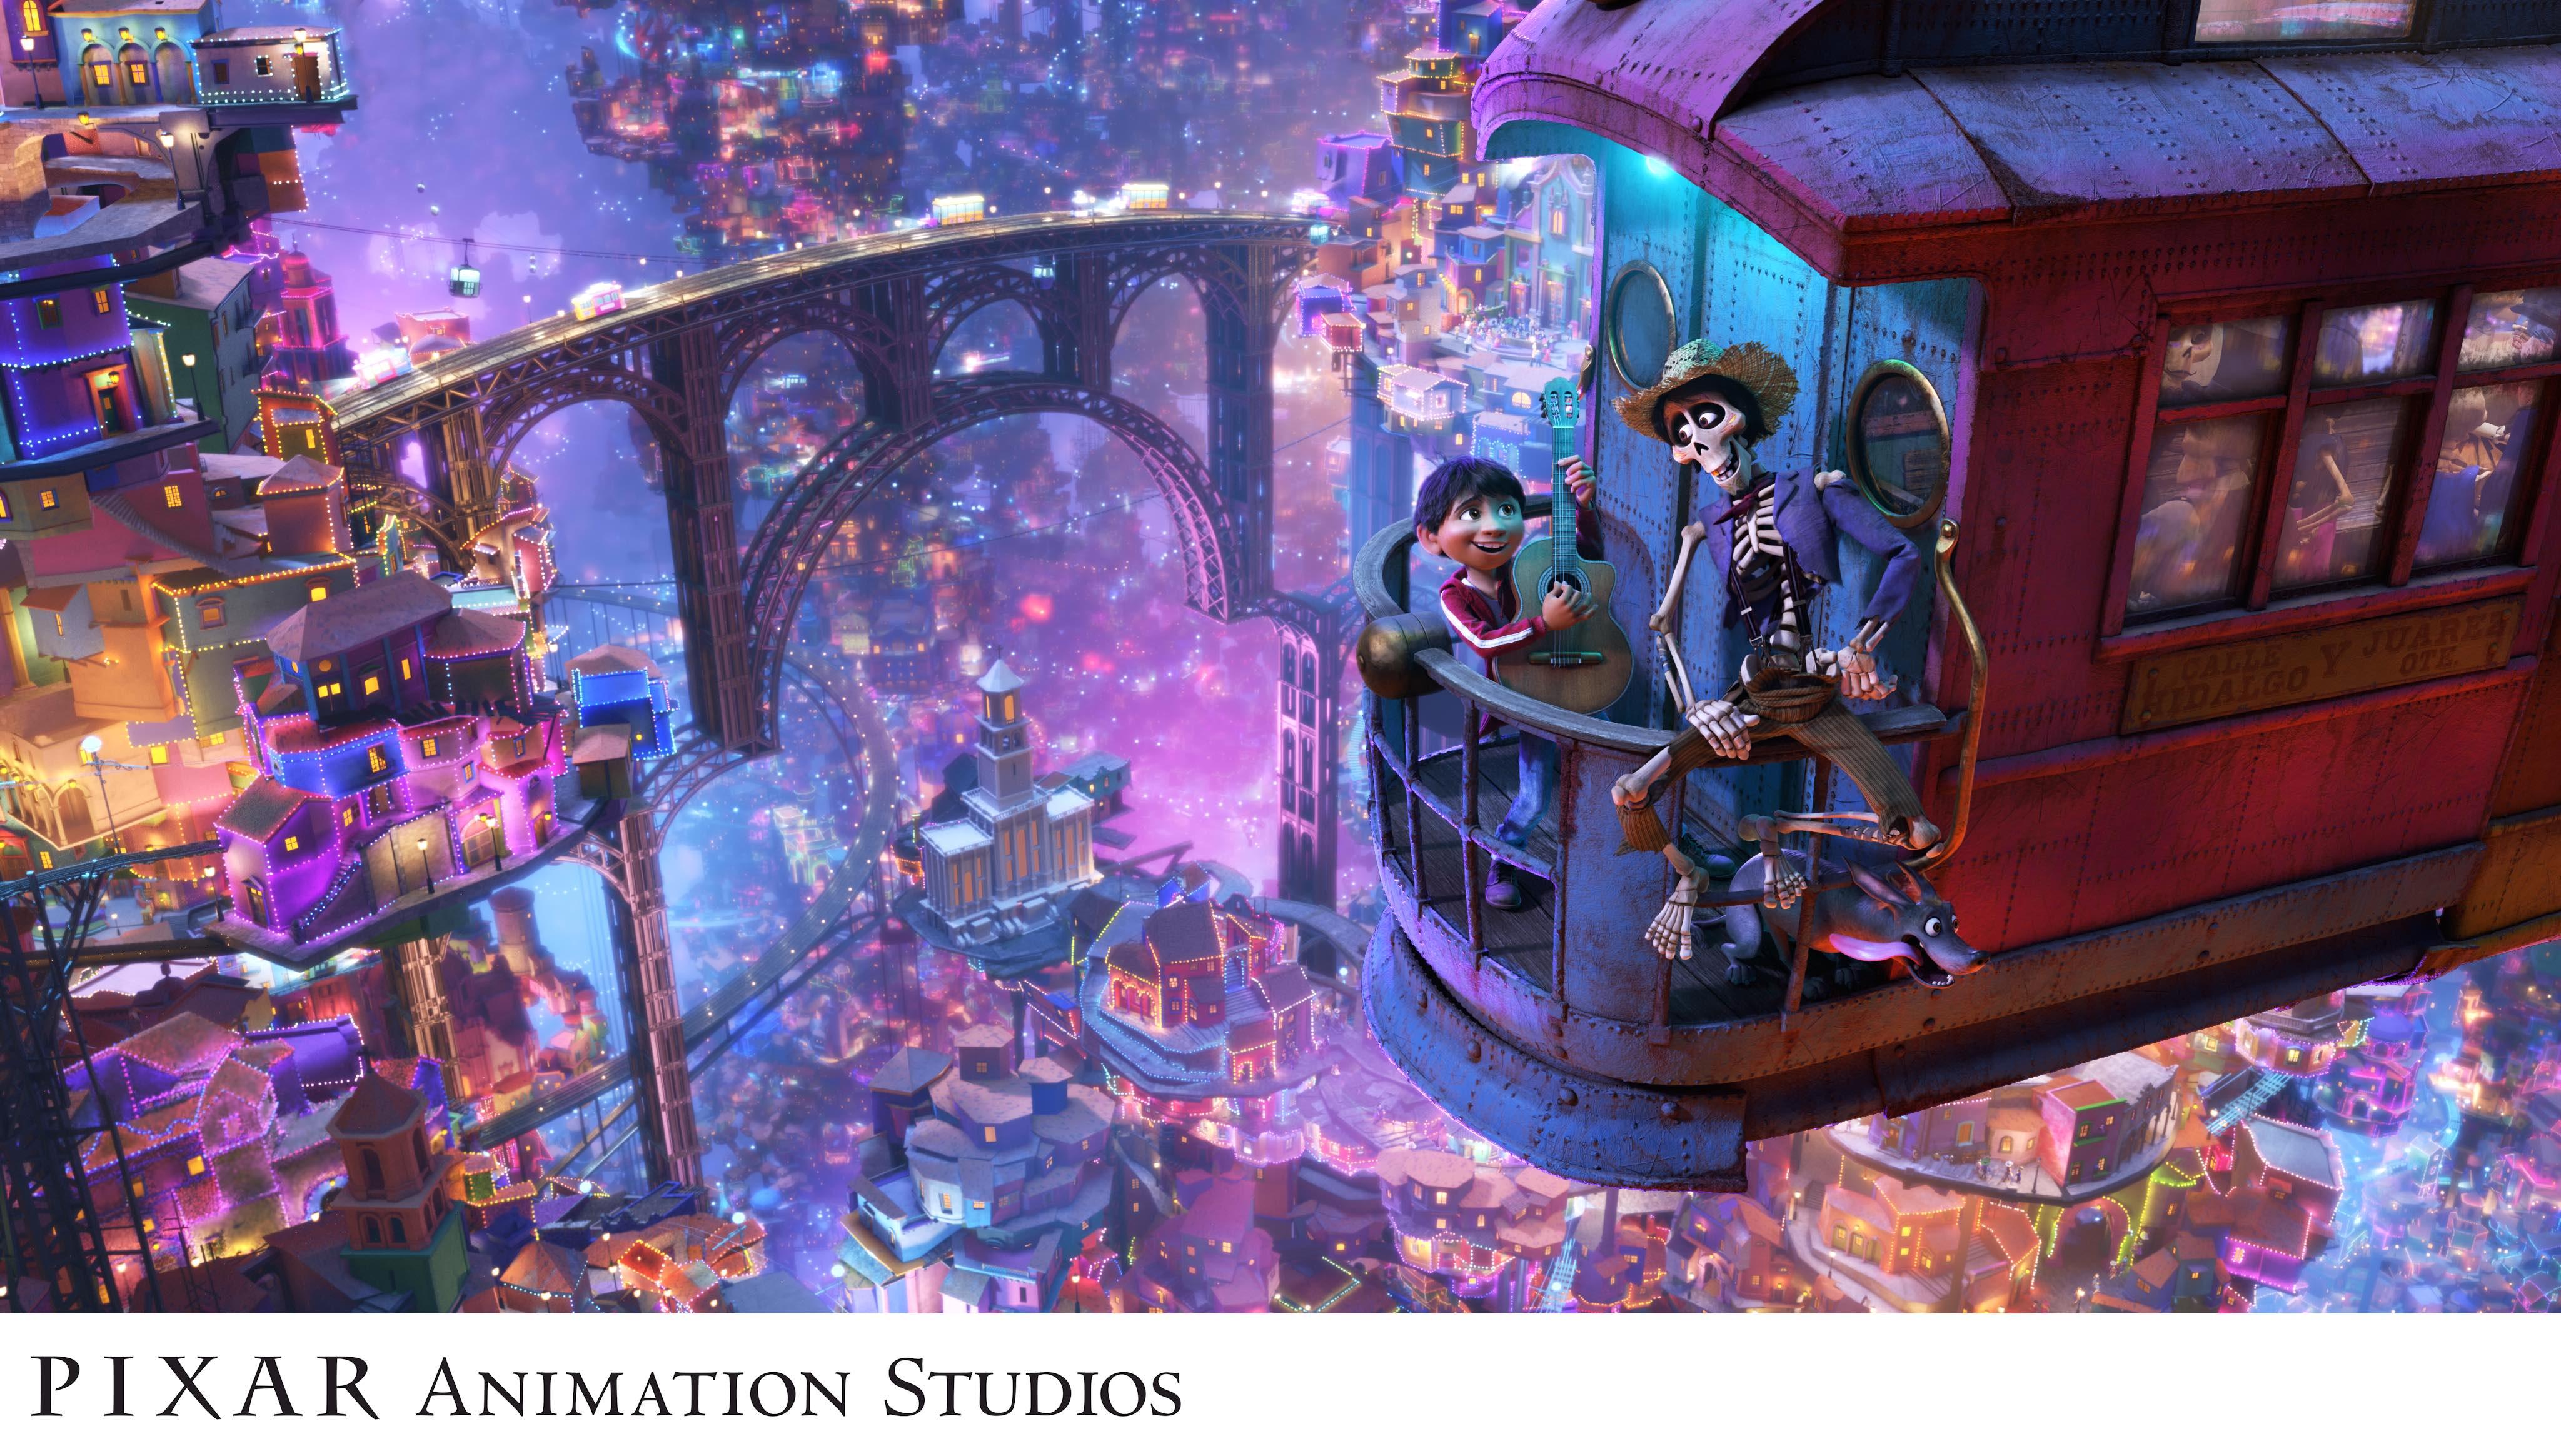 PixarCoco-image-2.jpg